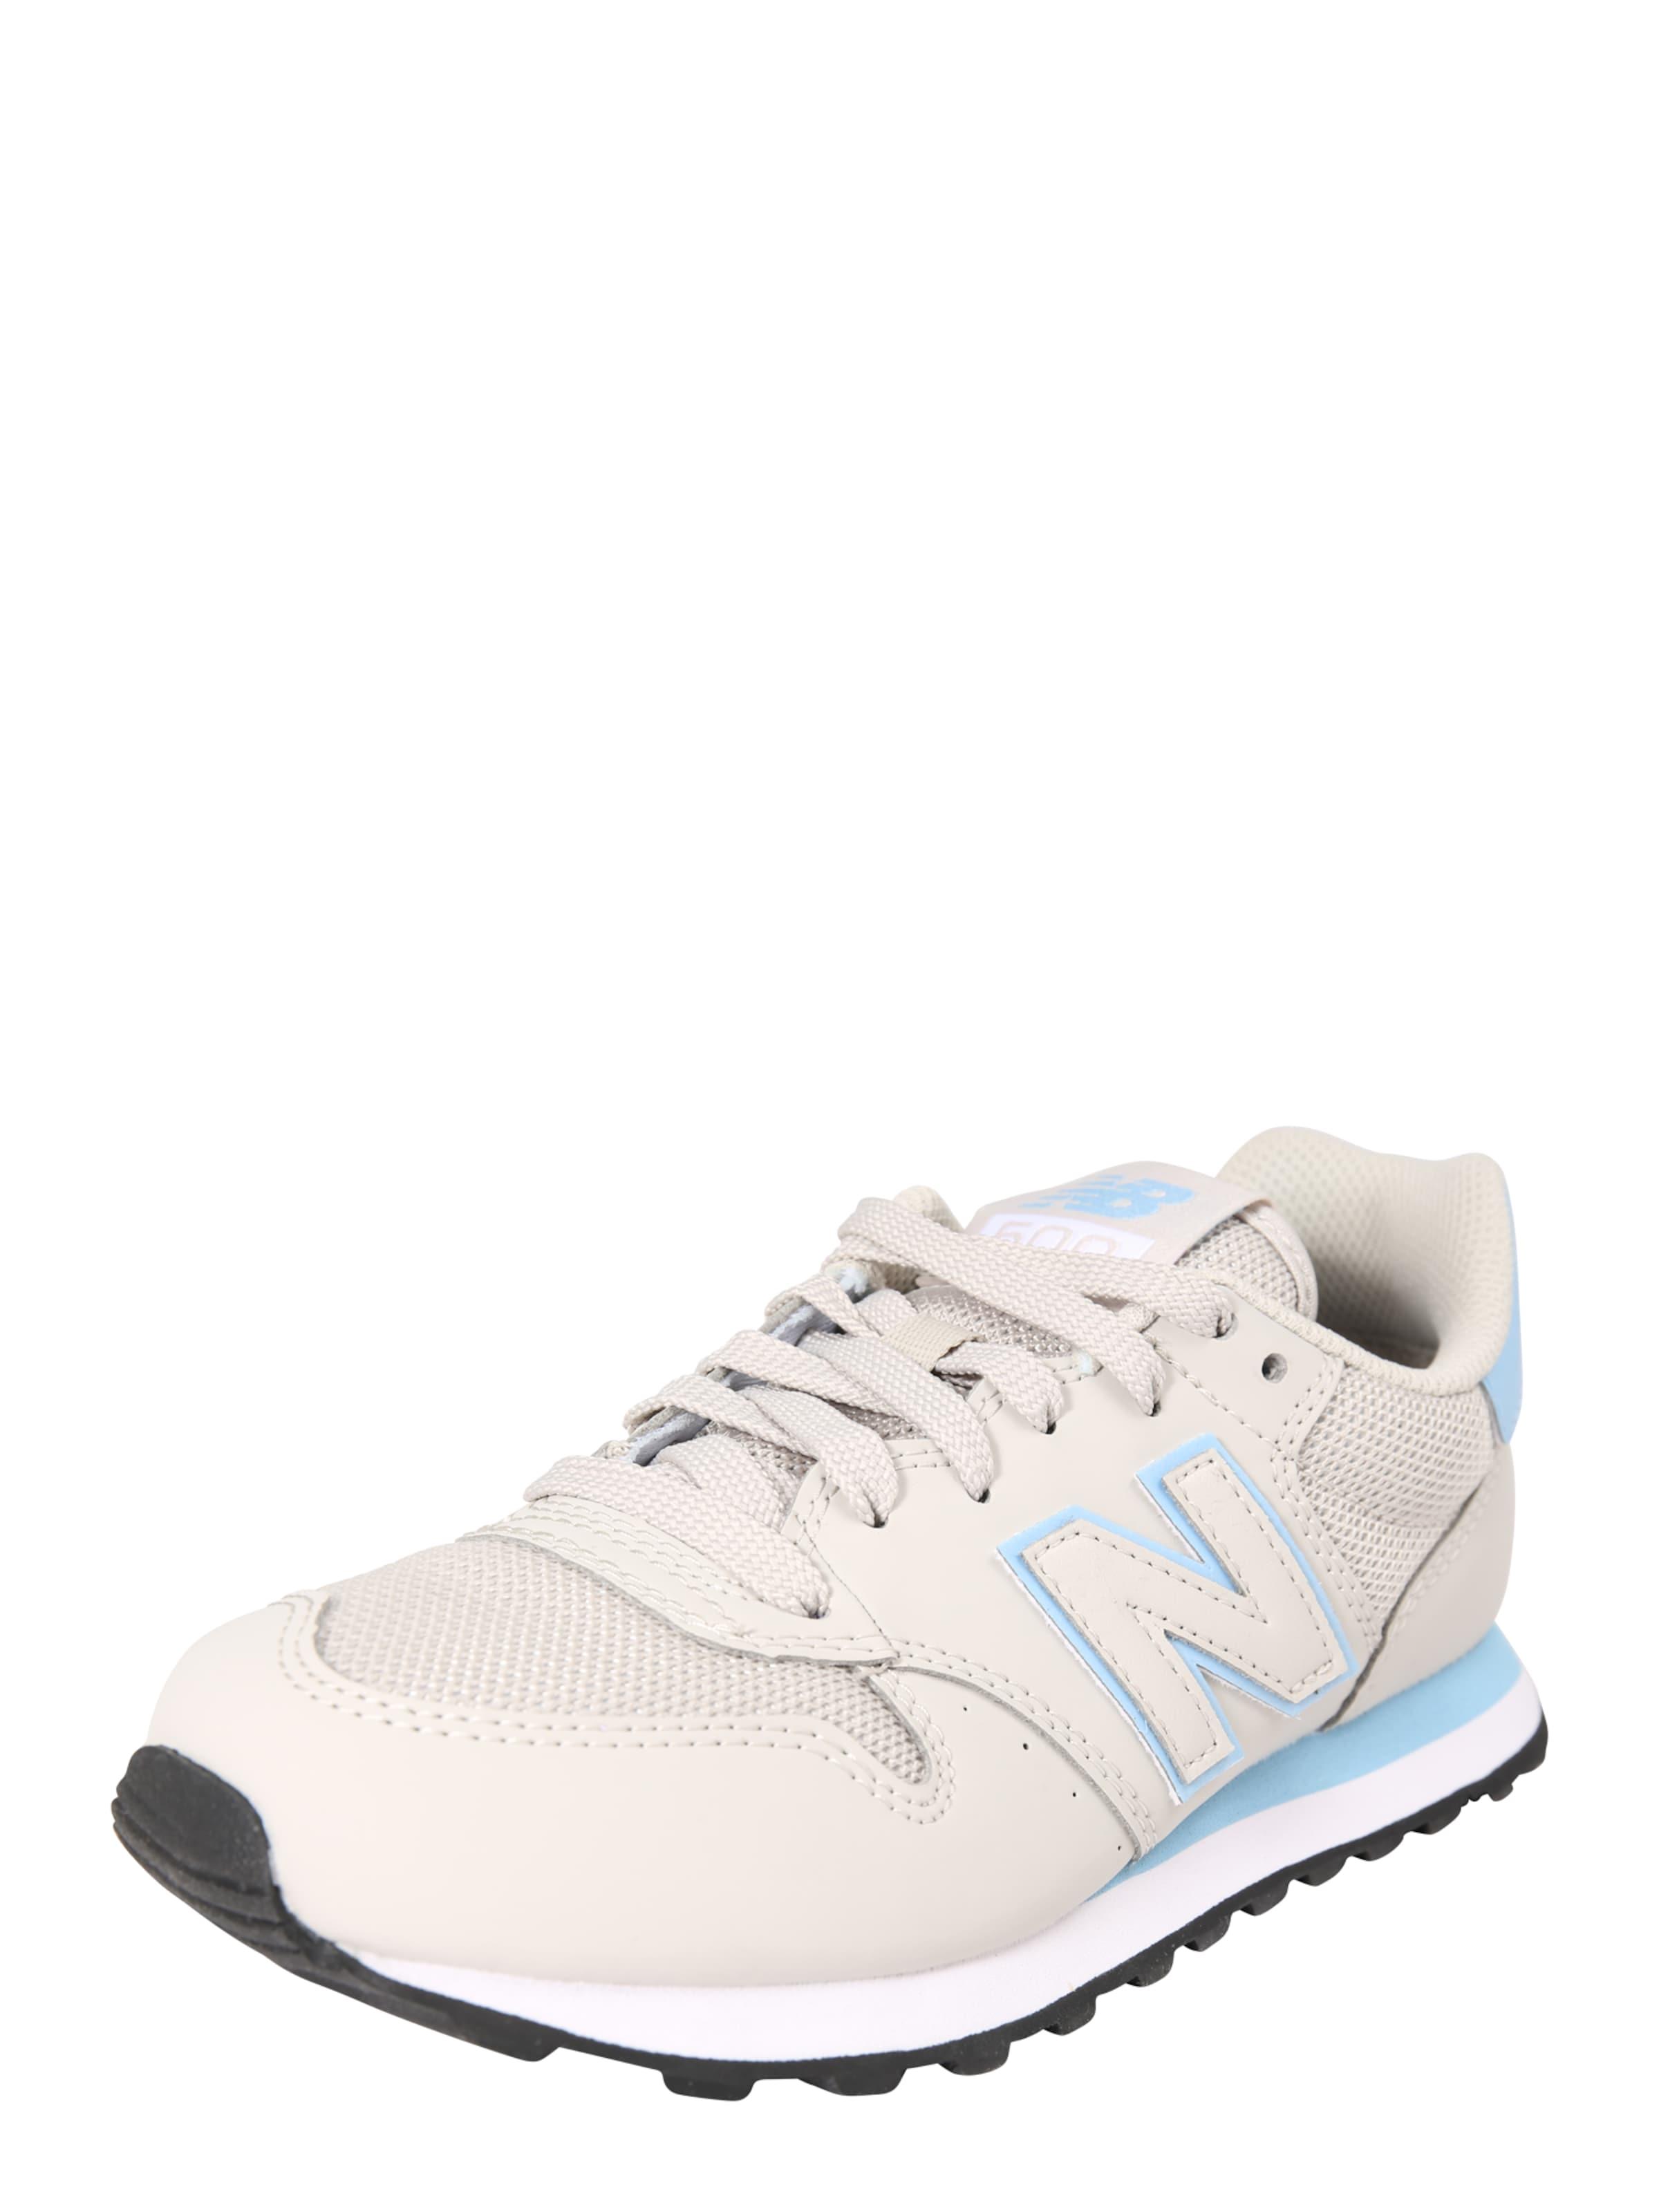 Sneaker Weiß Balance In 'gw500' HellblauHellgrau New pSzVMU